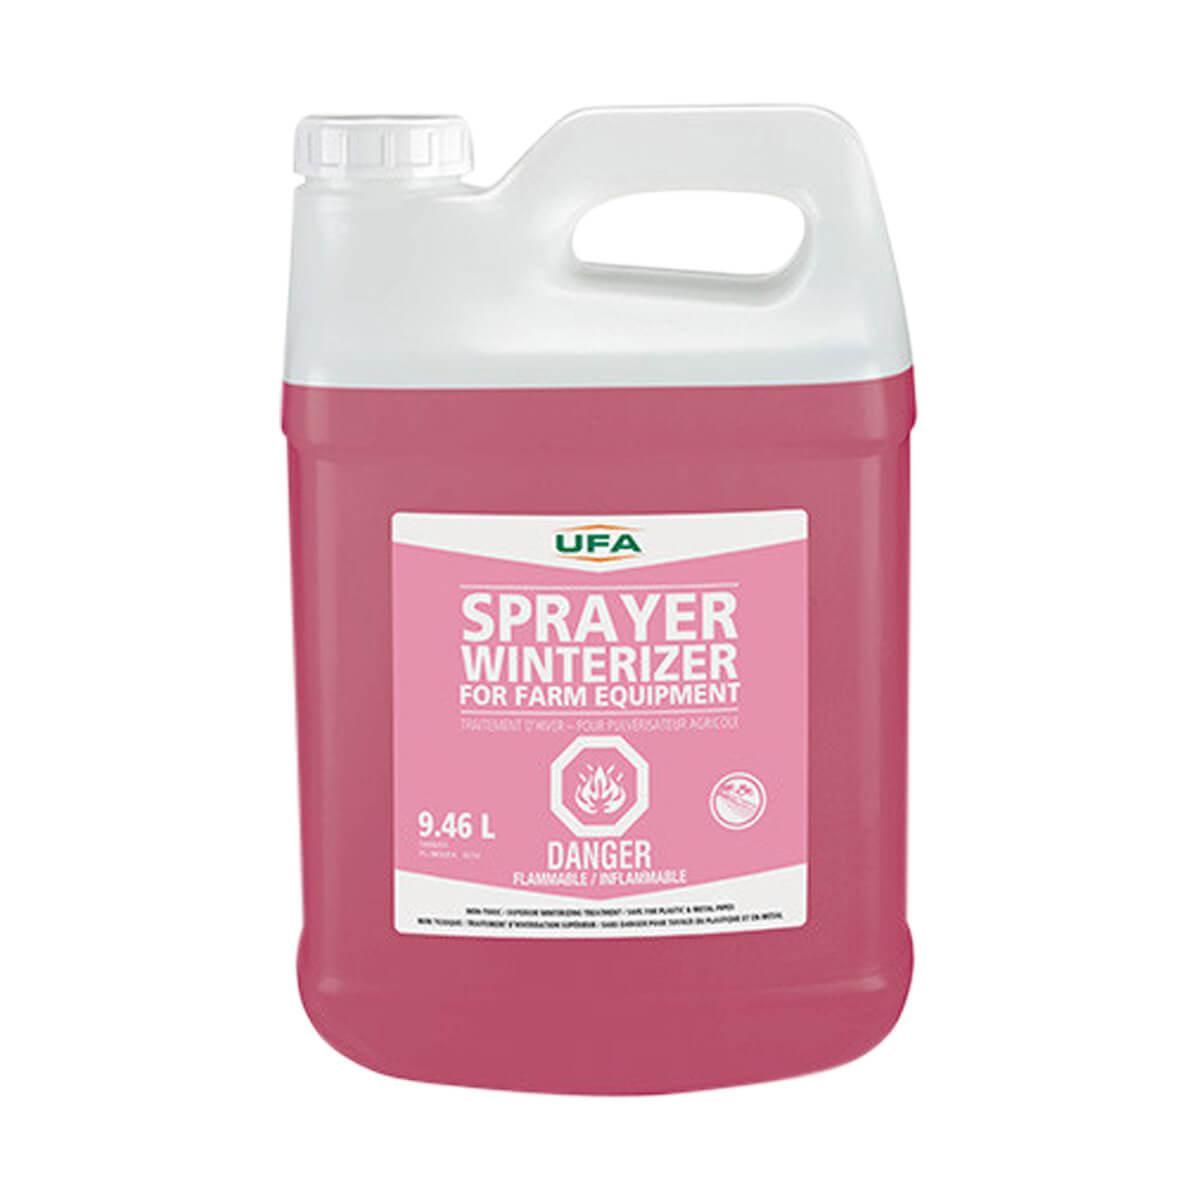 Sprayer Winterizer - 9.46 L